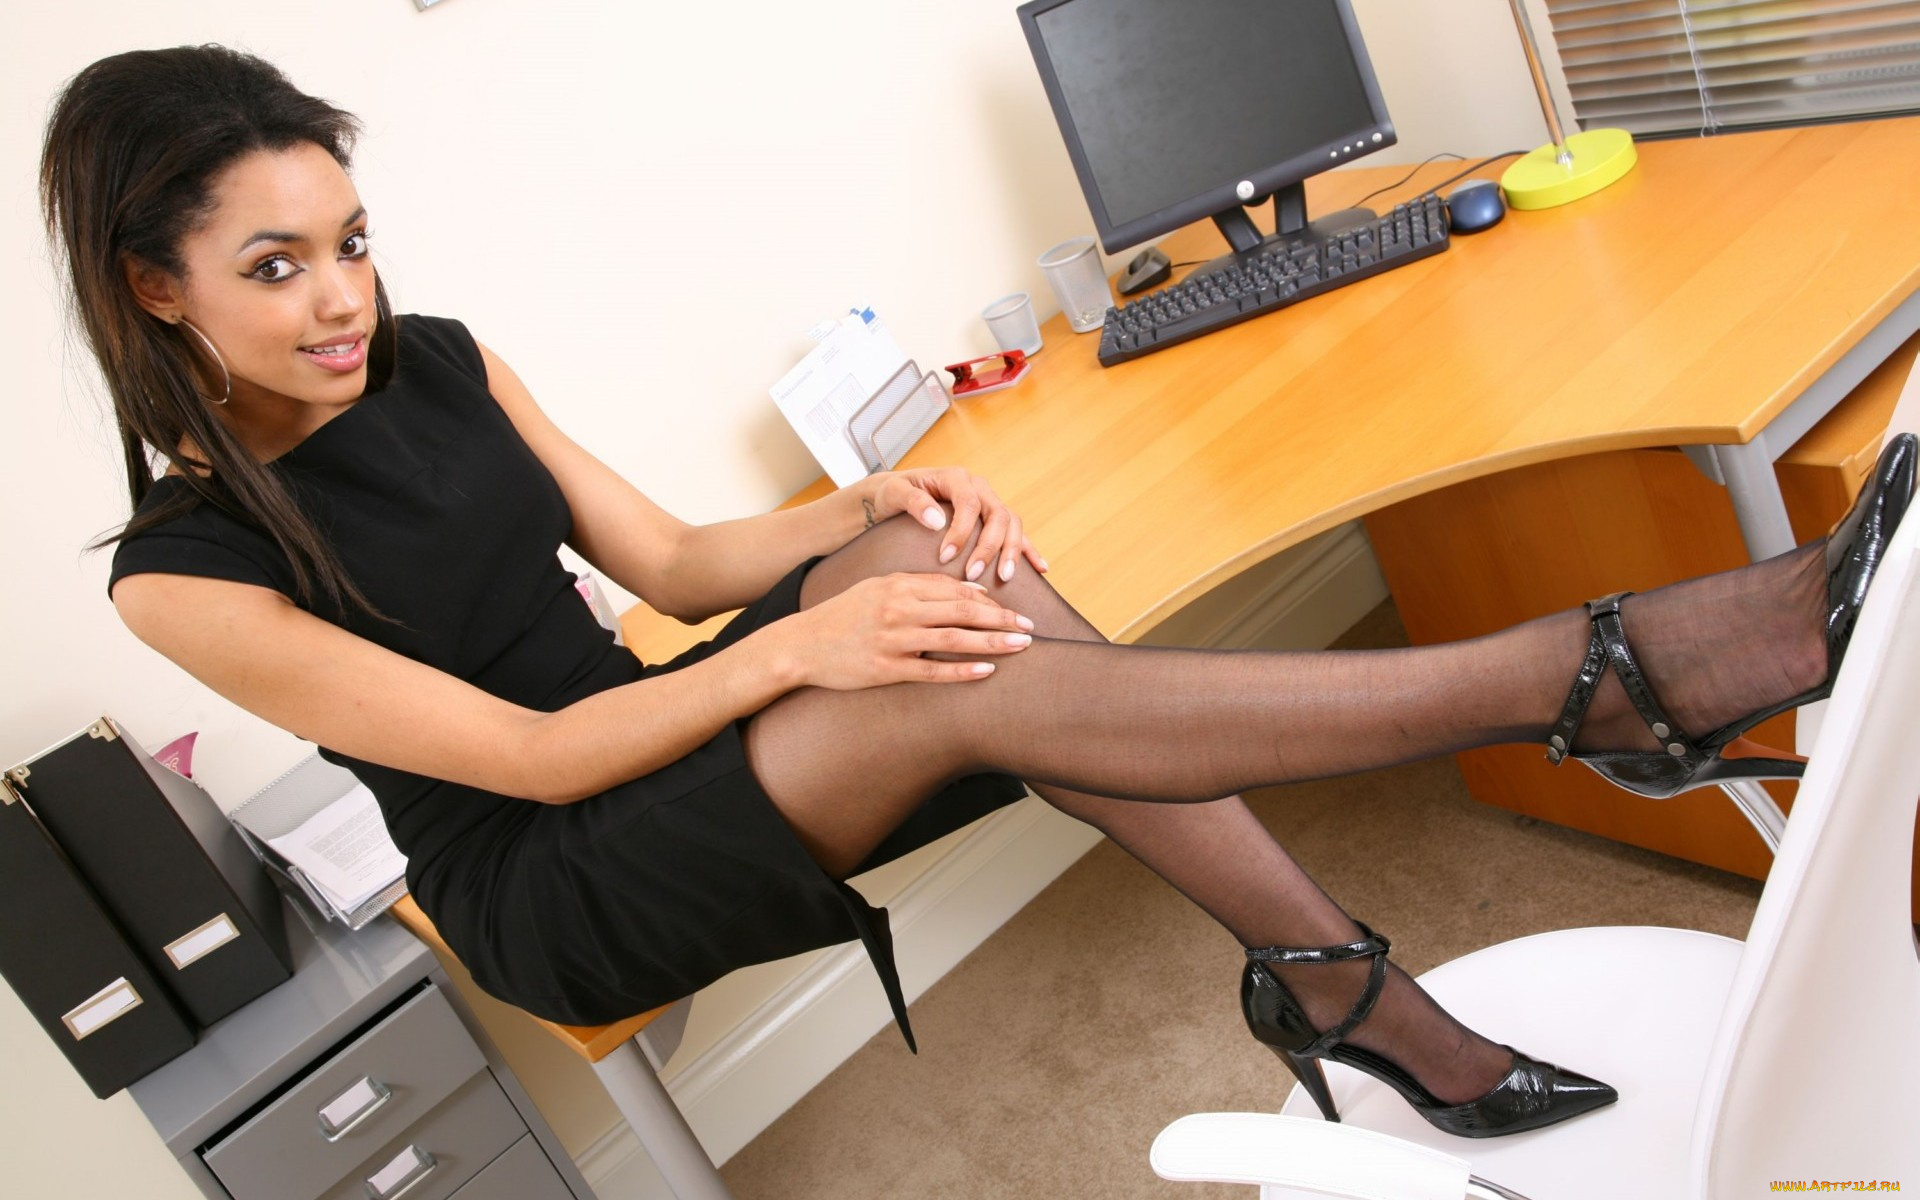 Секретарша на отдыхе, женщина и молодой пацан анал порно